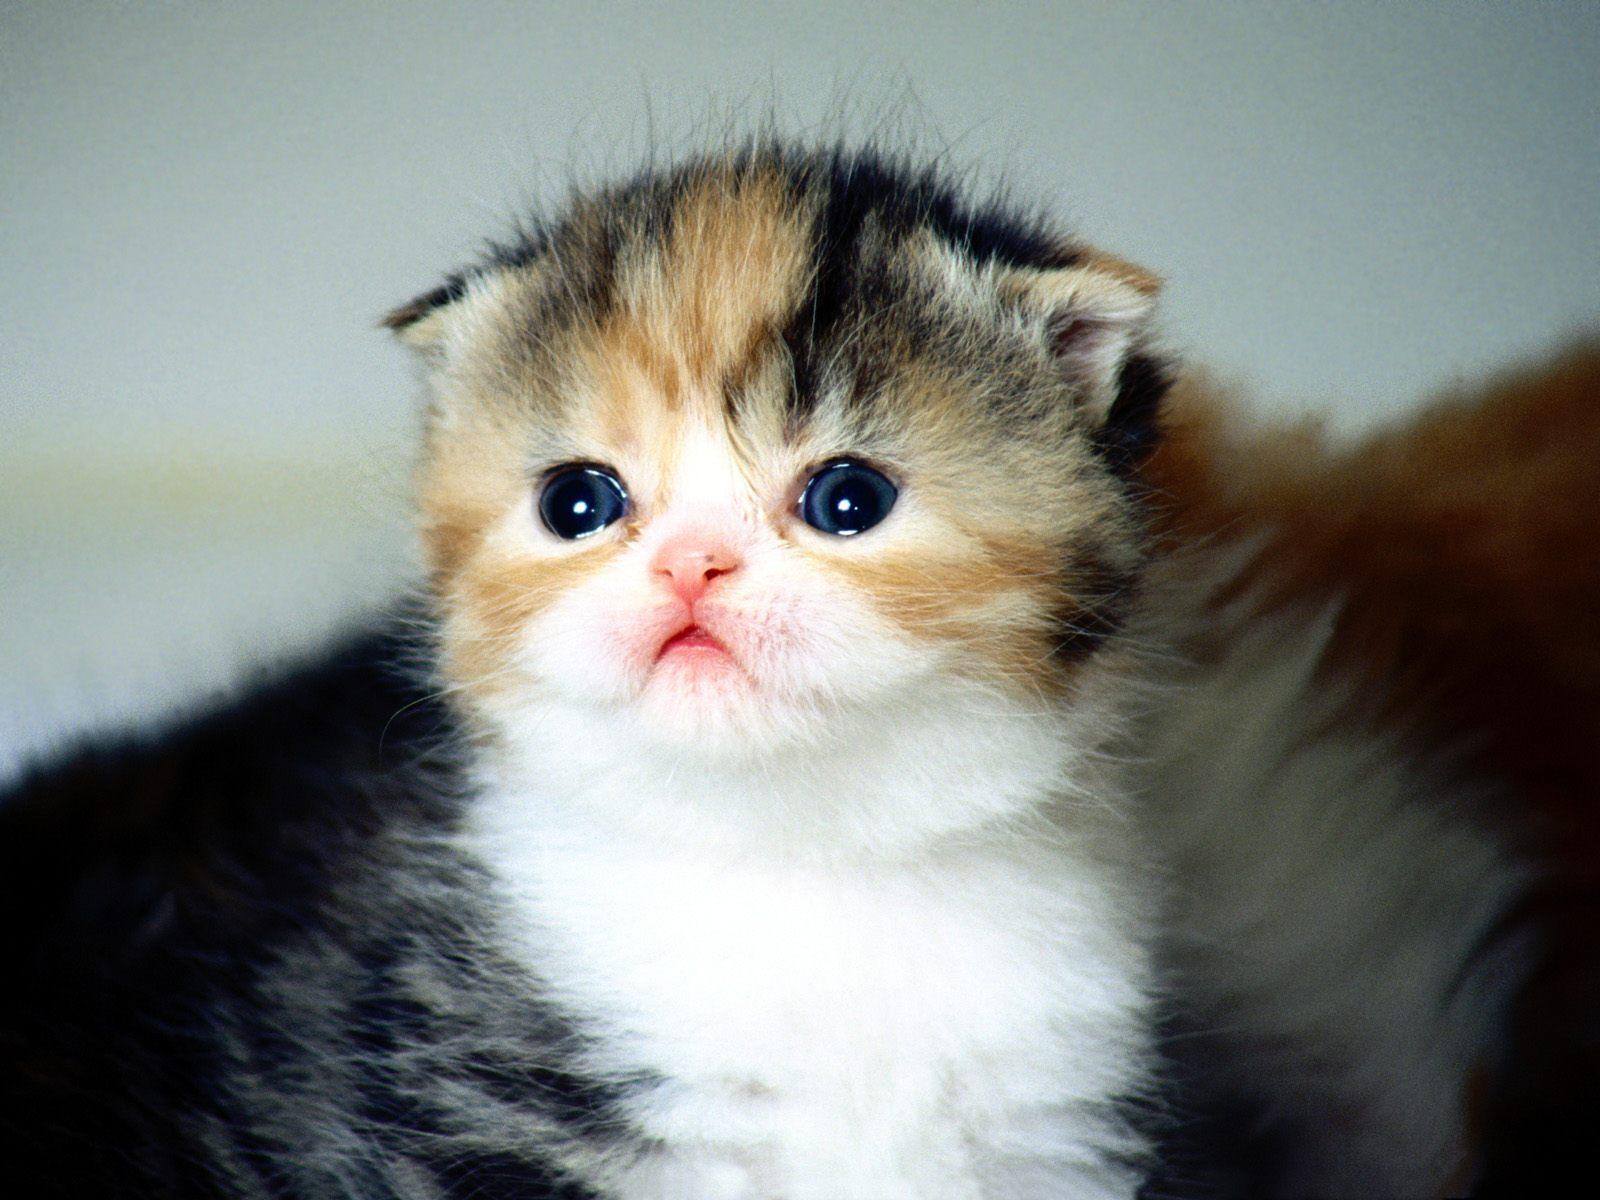 Hd wallpaper cat - Cats Are Little Sweet Cute Backgorund Wallpaper Full Hd Wallpapers